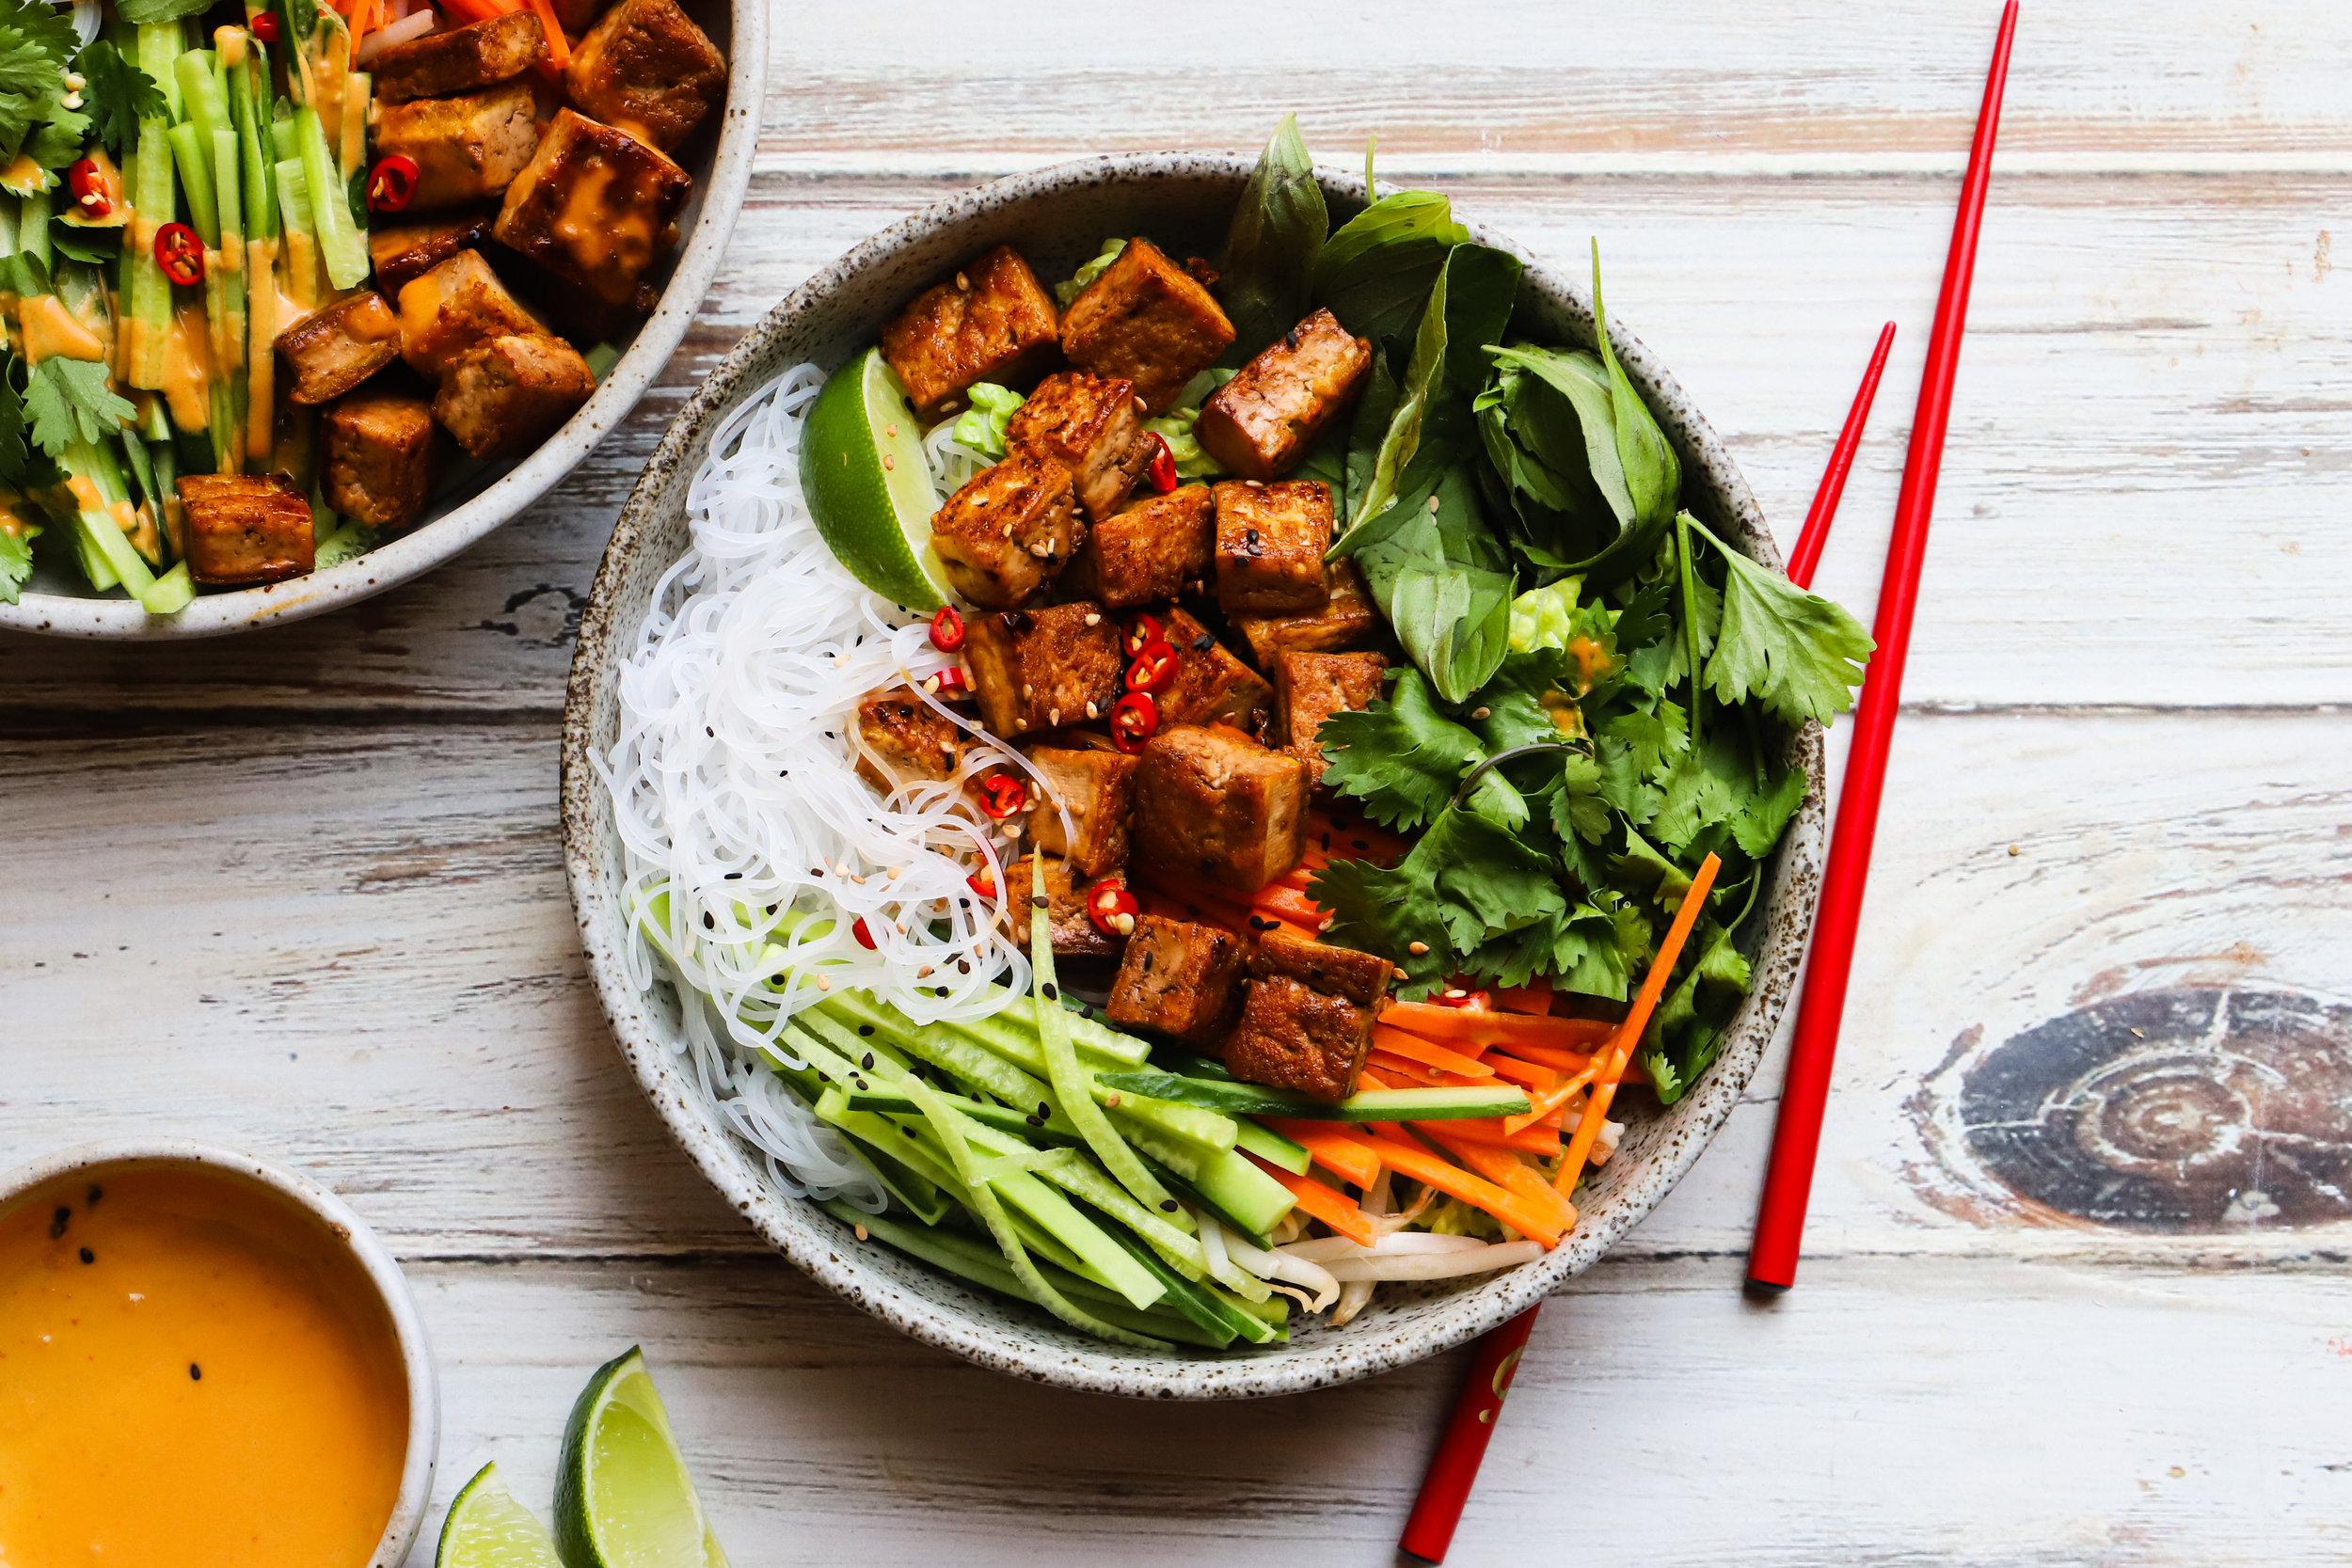 Vegan Vietnamese Noodle Salad